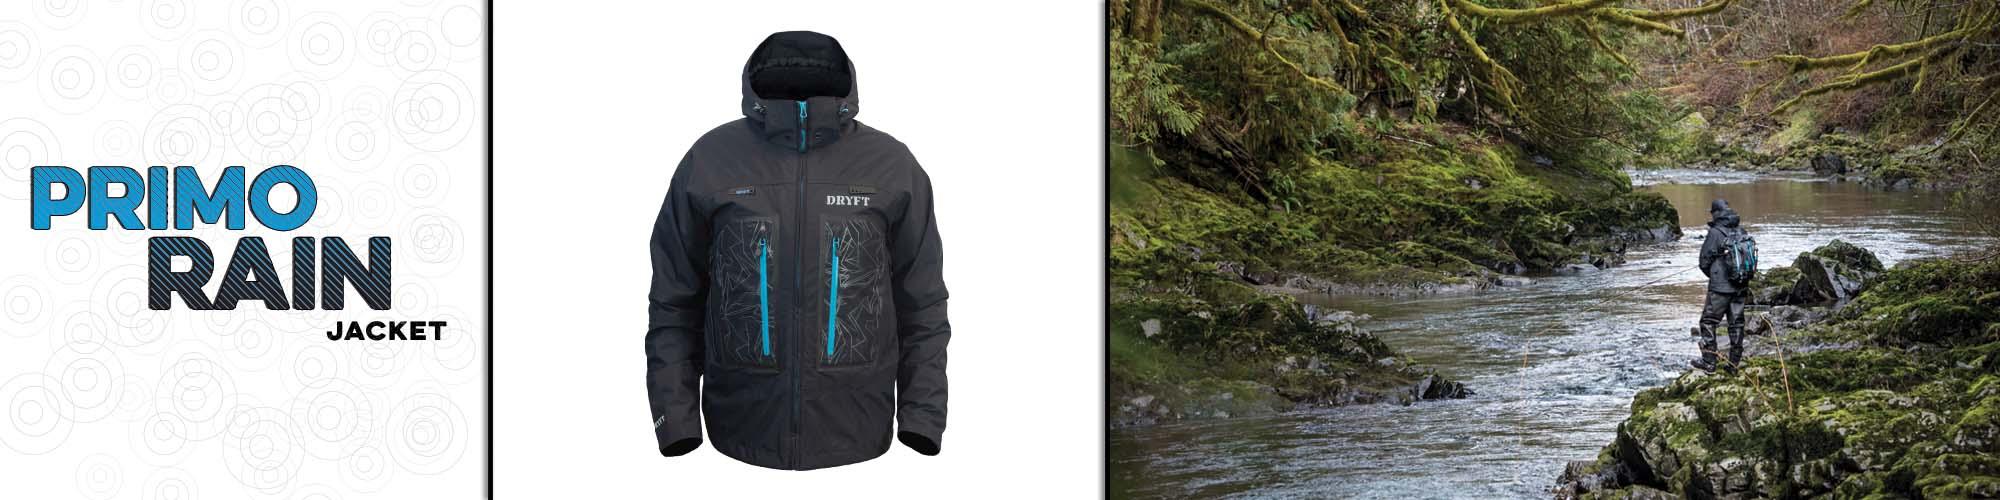 DRYFT Primo Rain Jacket